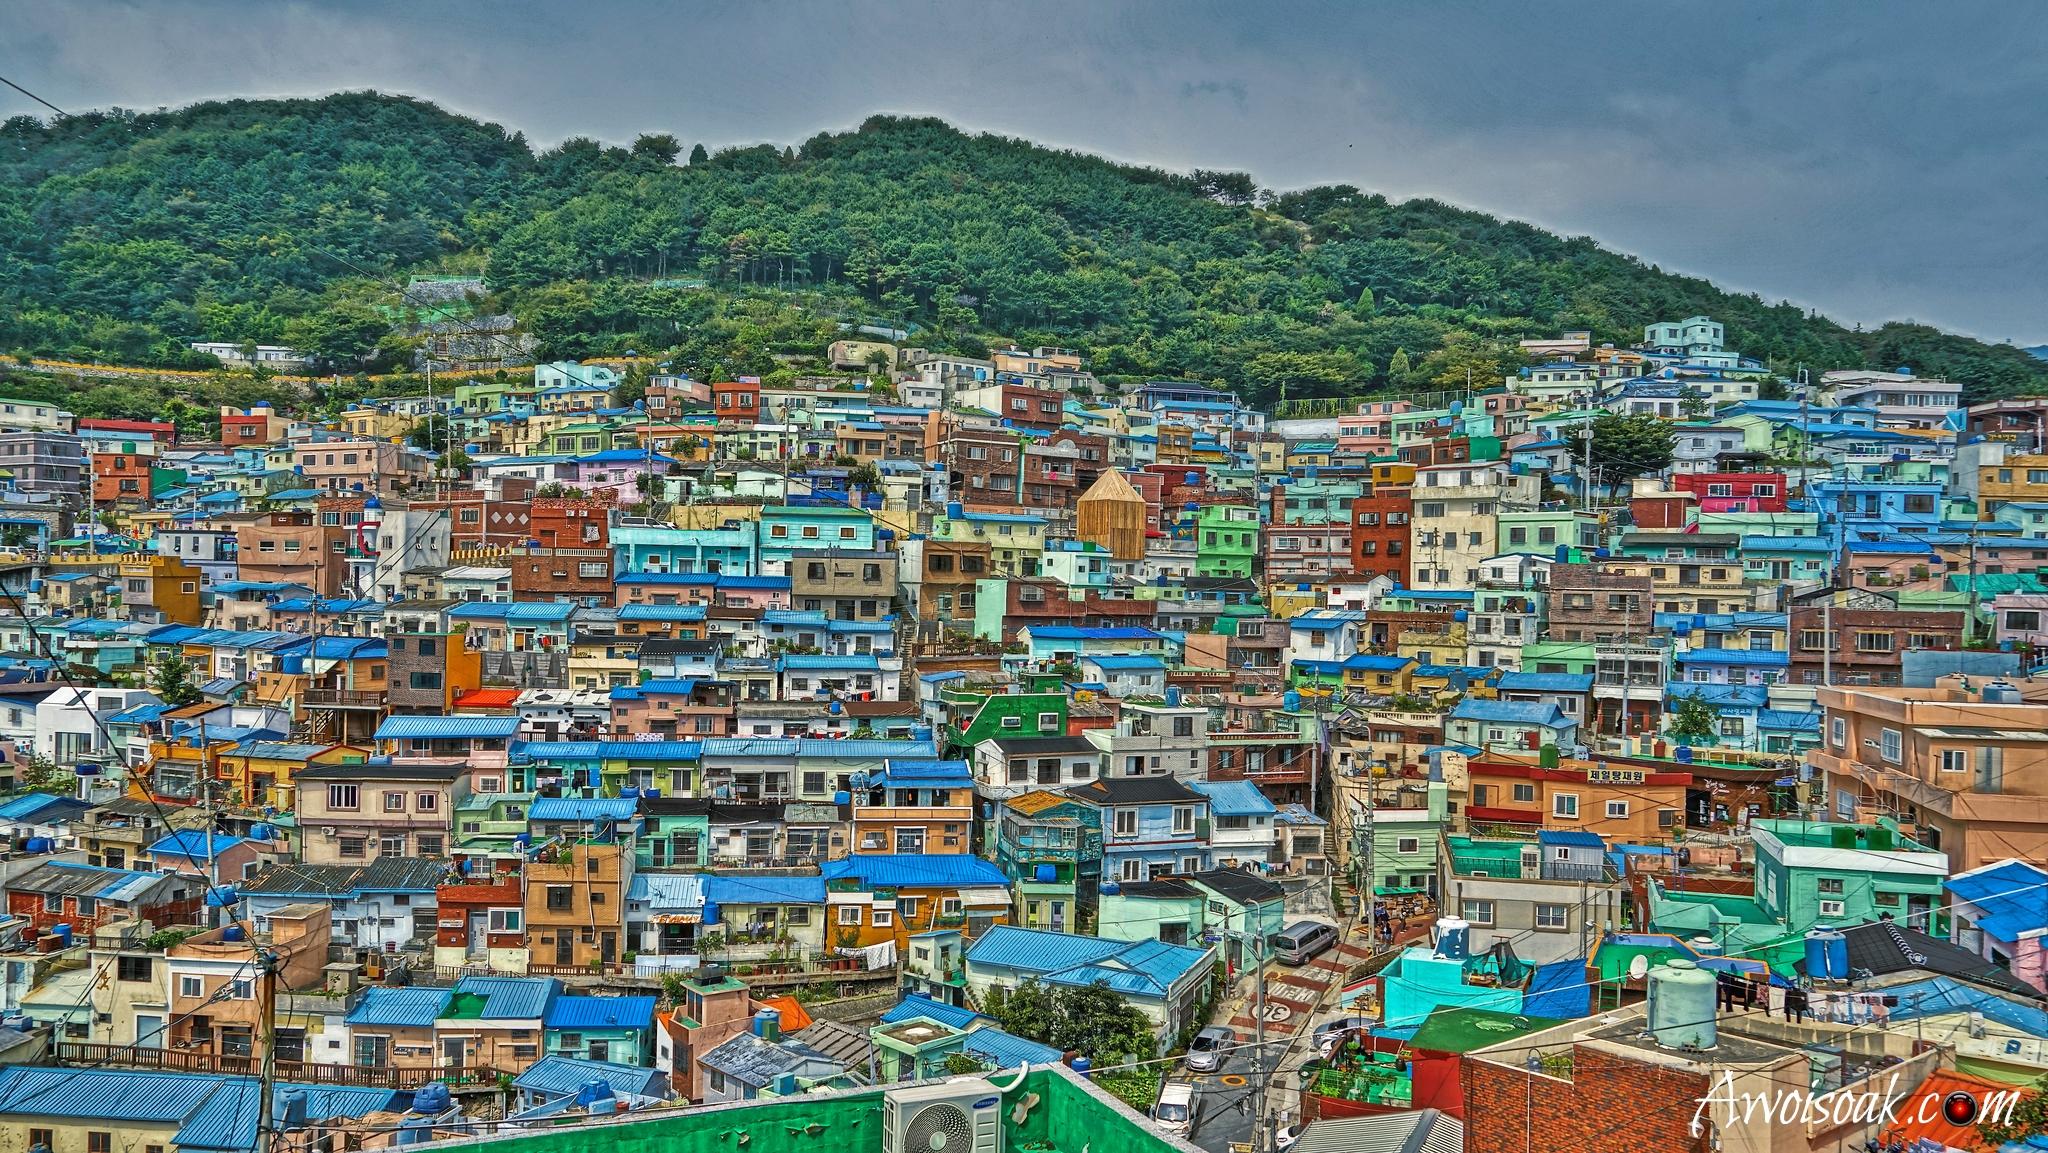 Busan Gamcheon Culture Village, Korea